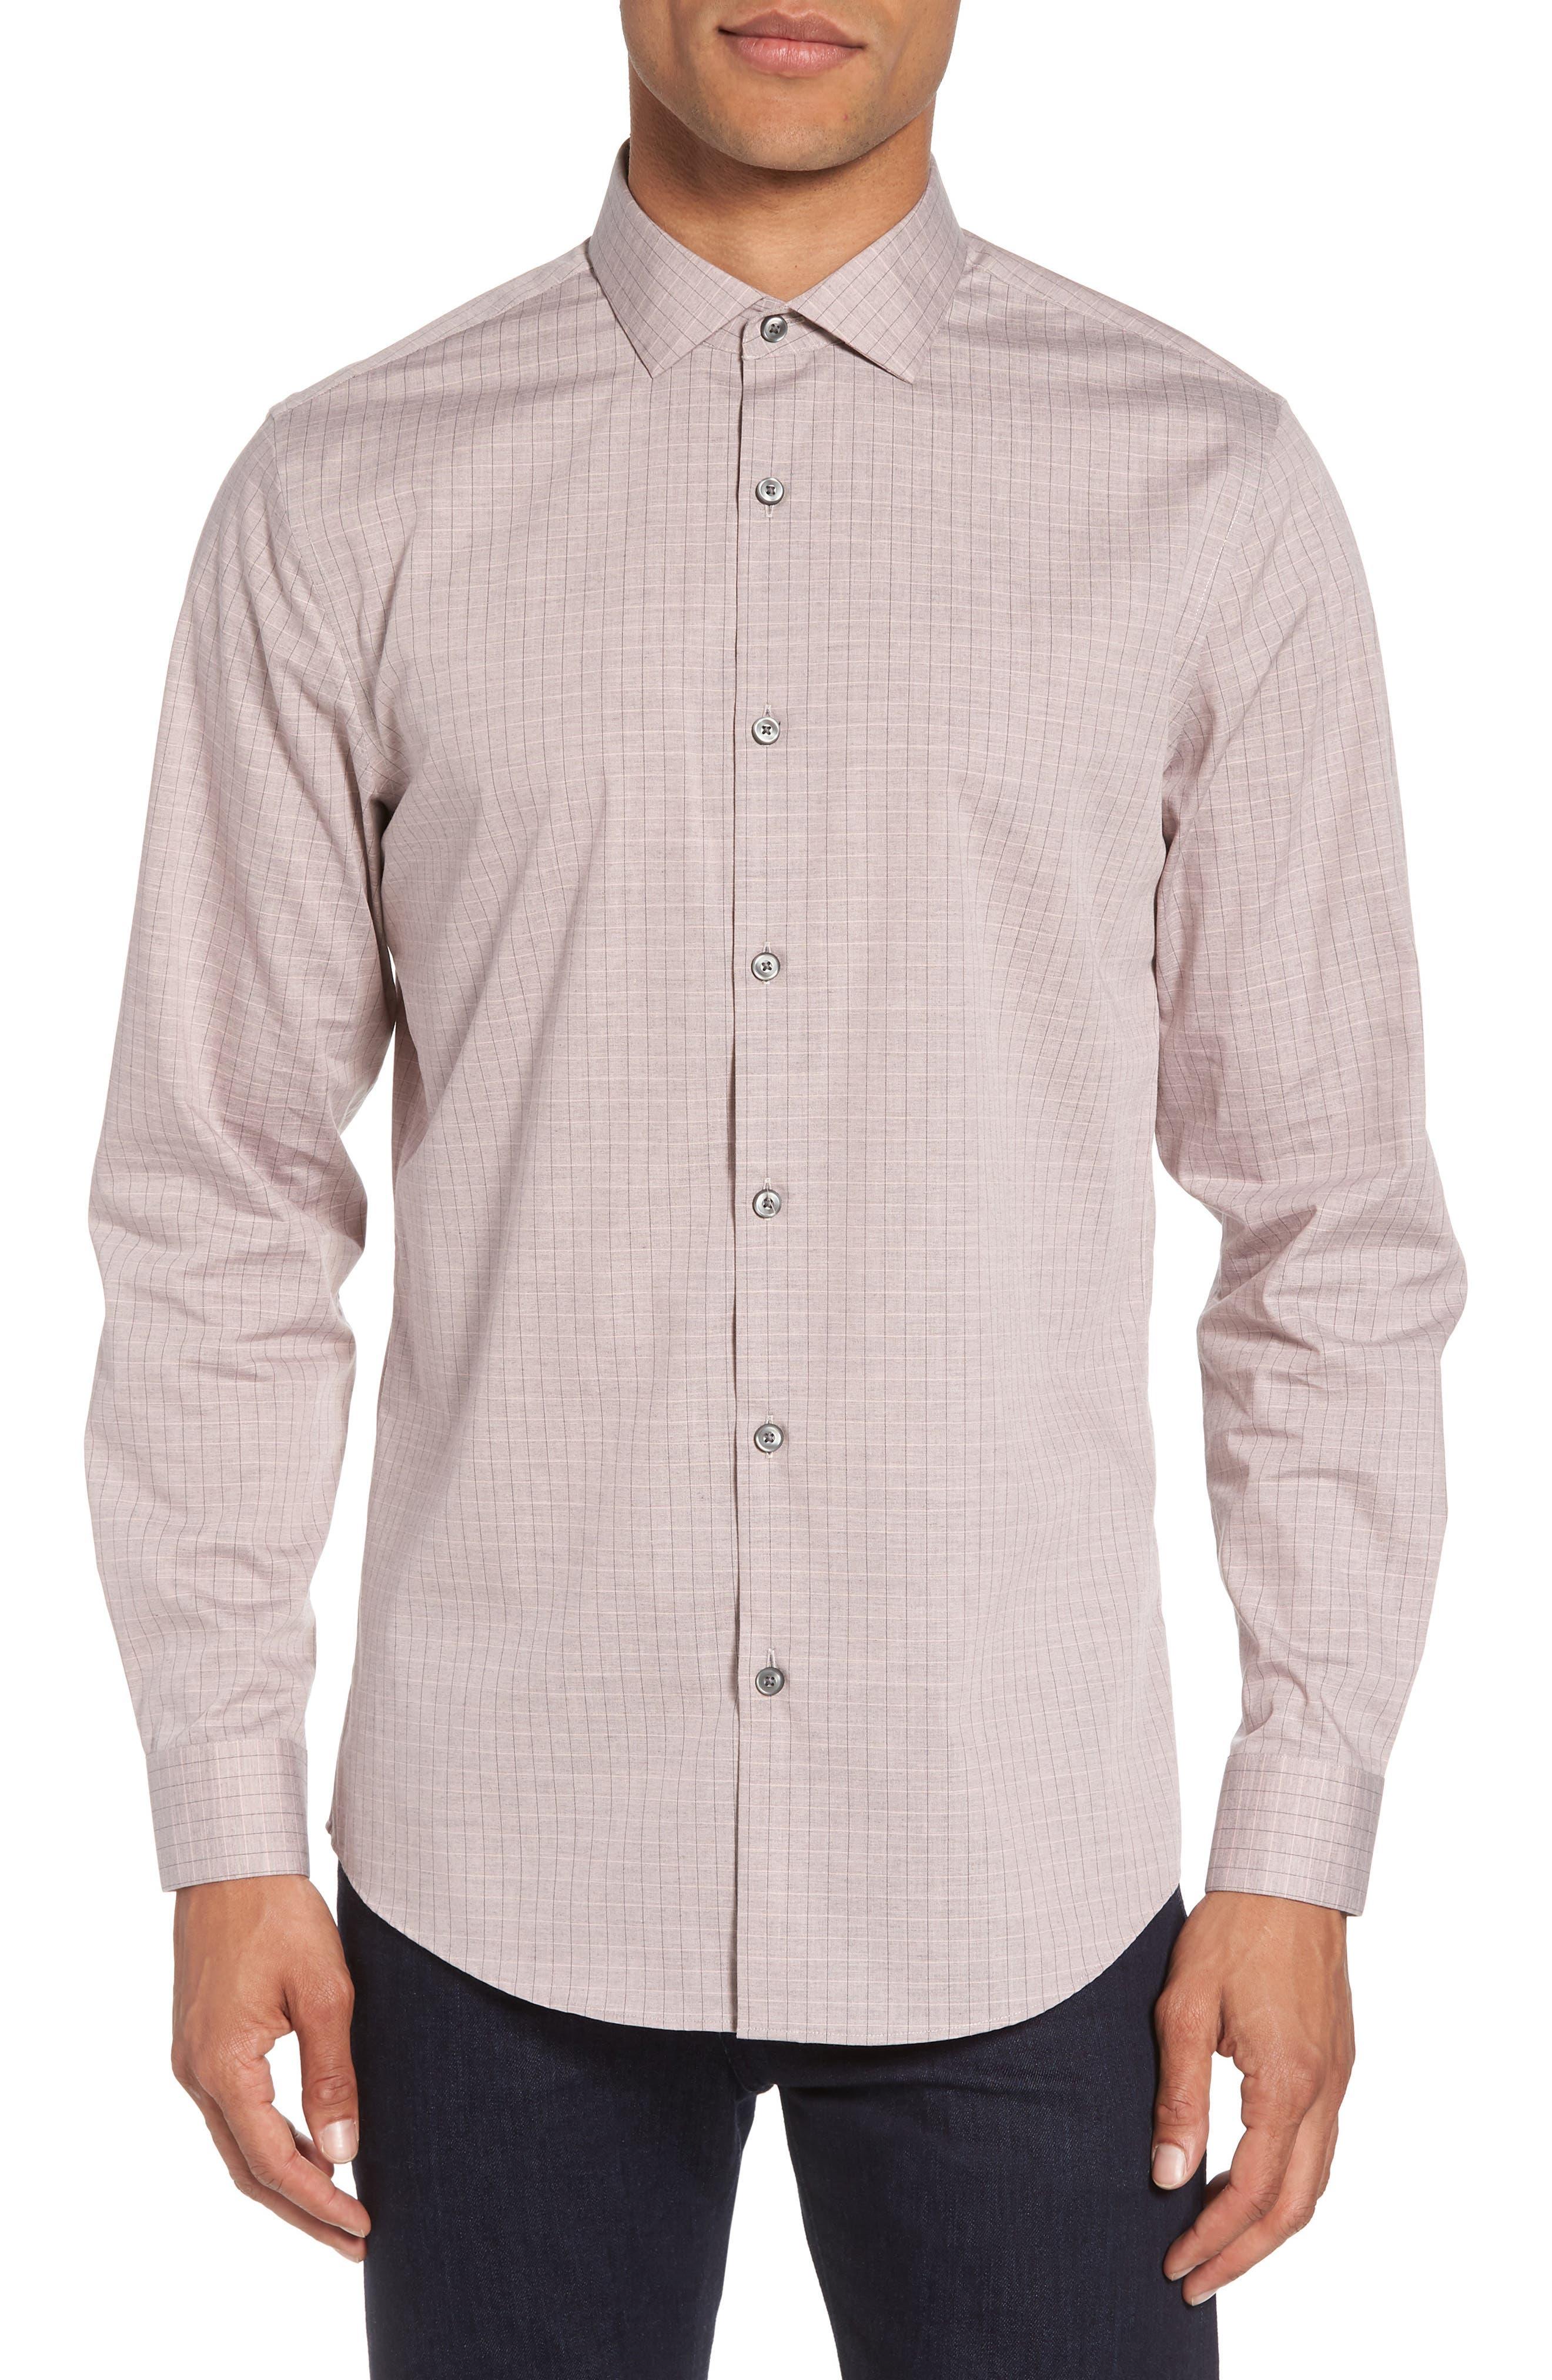 Grid Sport Shirt,                             Main thumbnail 1, color,                             Pink Silver Heather Grid